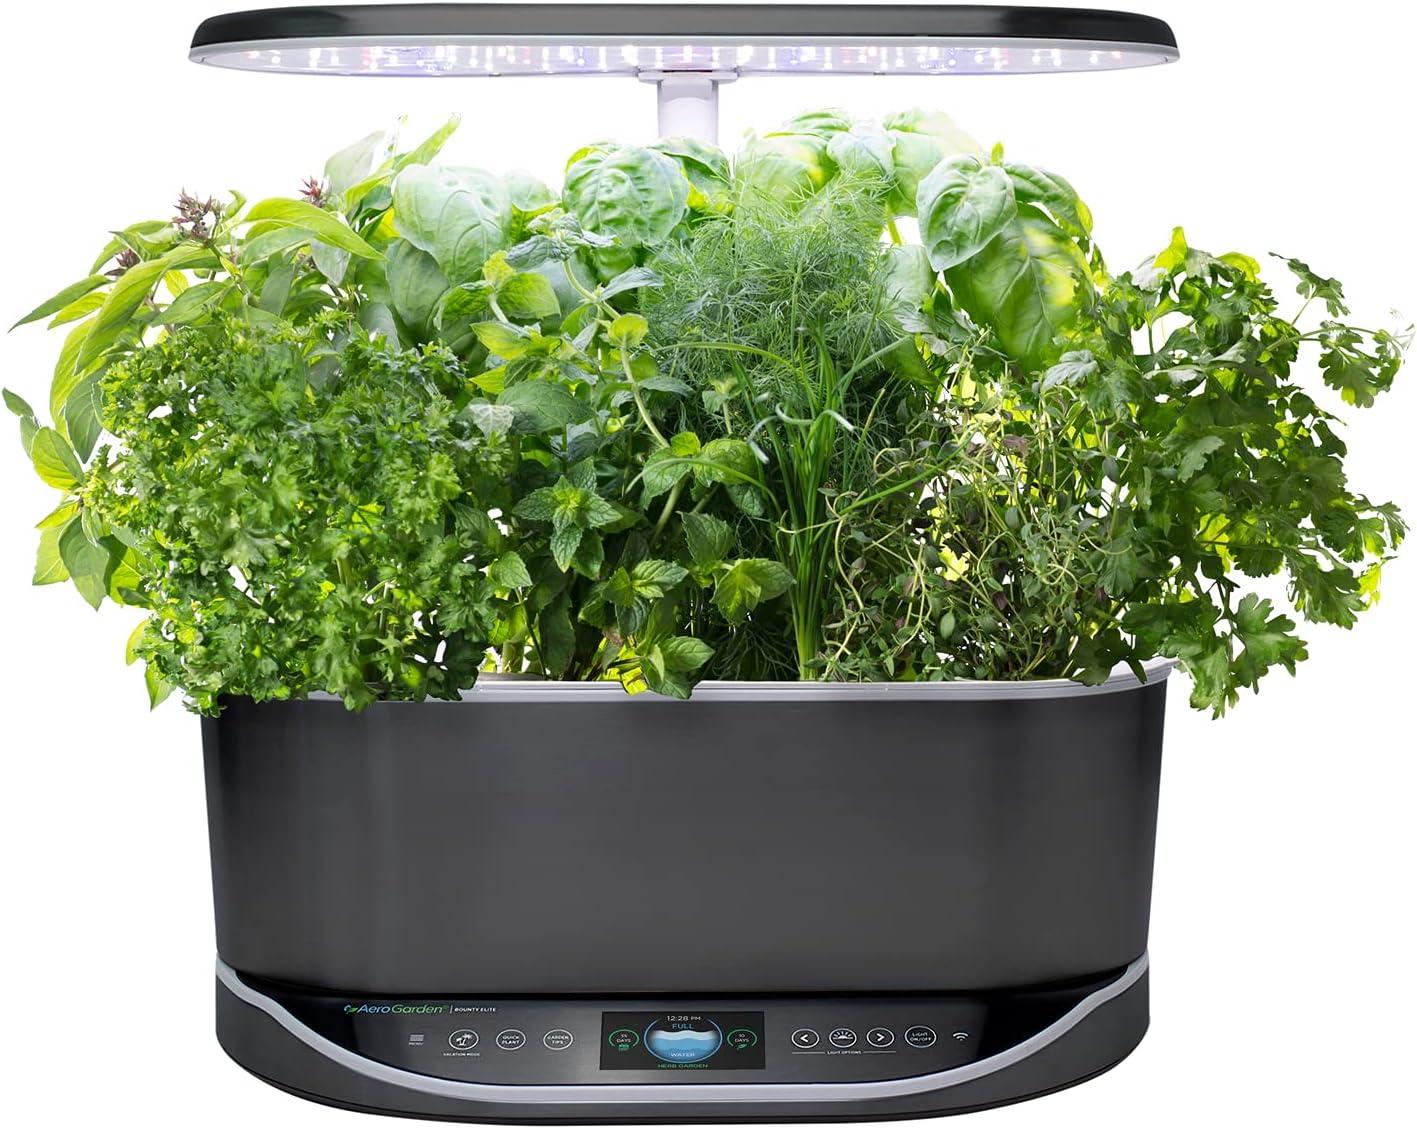 AeroGarden Bounty Elite - Indoor Garden with LED Grow Light, WiFi and Alexa Compatible, Platinum Stainless